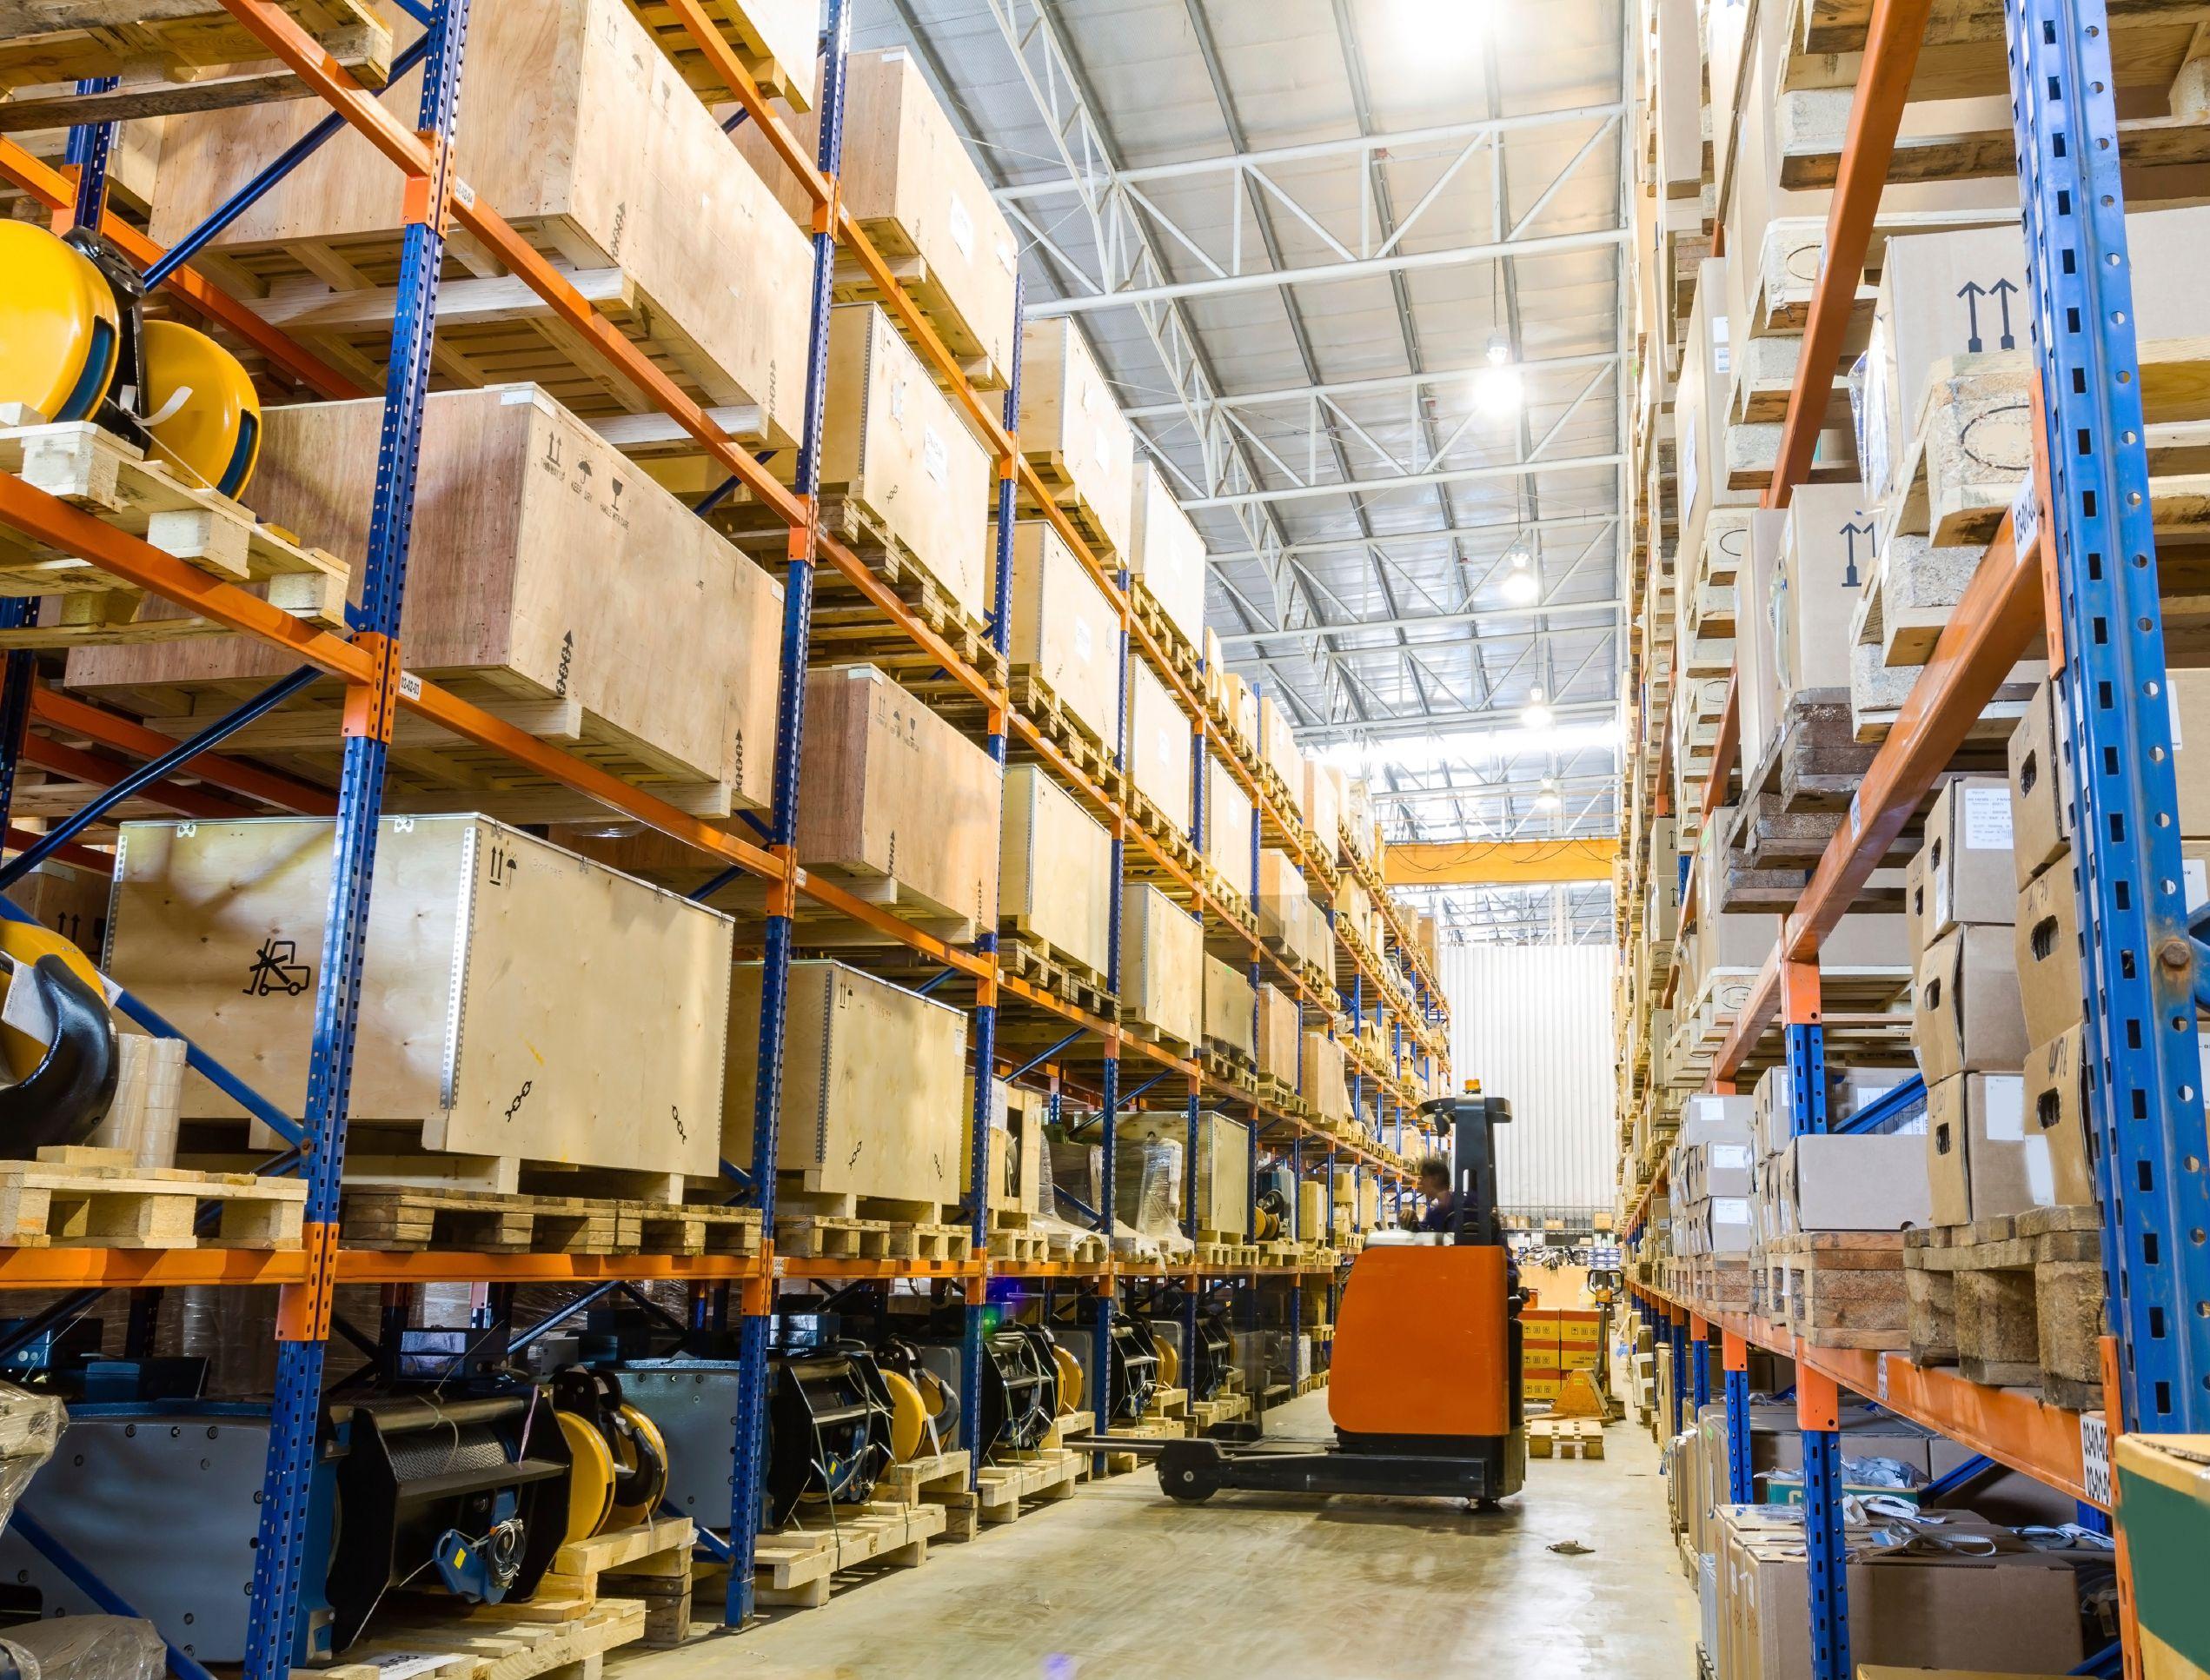 Penske Logistics Quest for Quality Award Winner